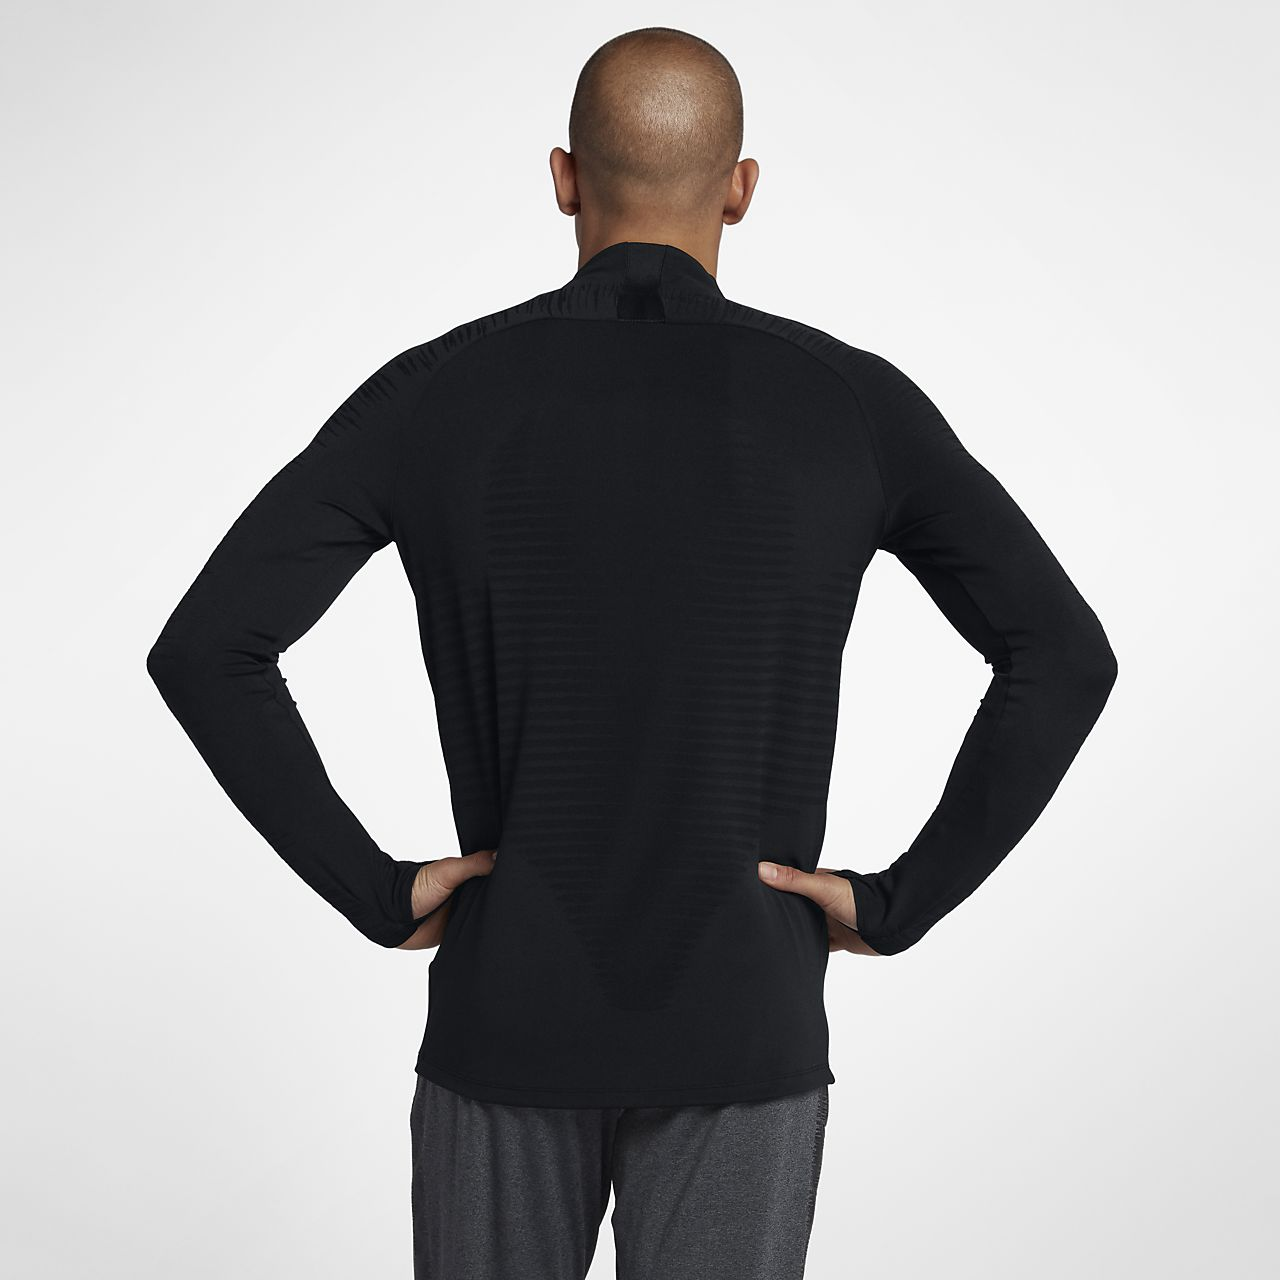 df89e9402 Nike VaporKnit Strike Men's Long-Sleeve Football Top. Nike.com NO